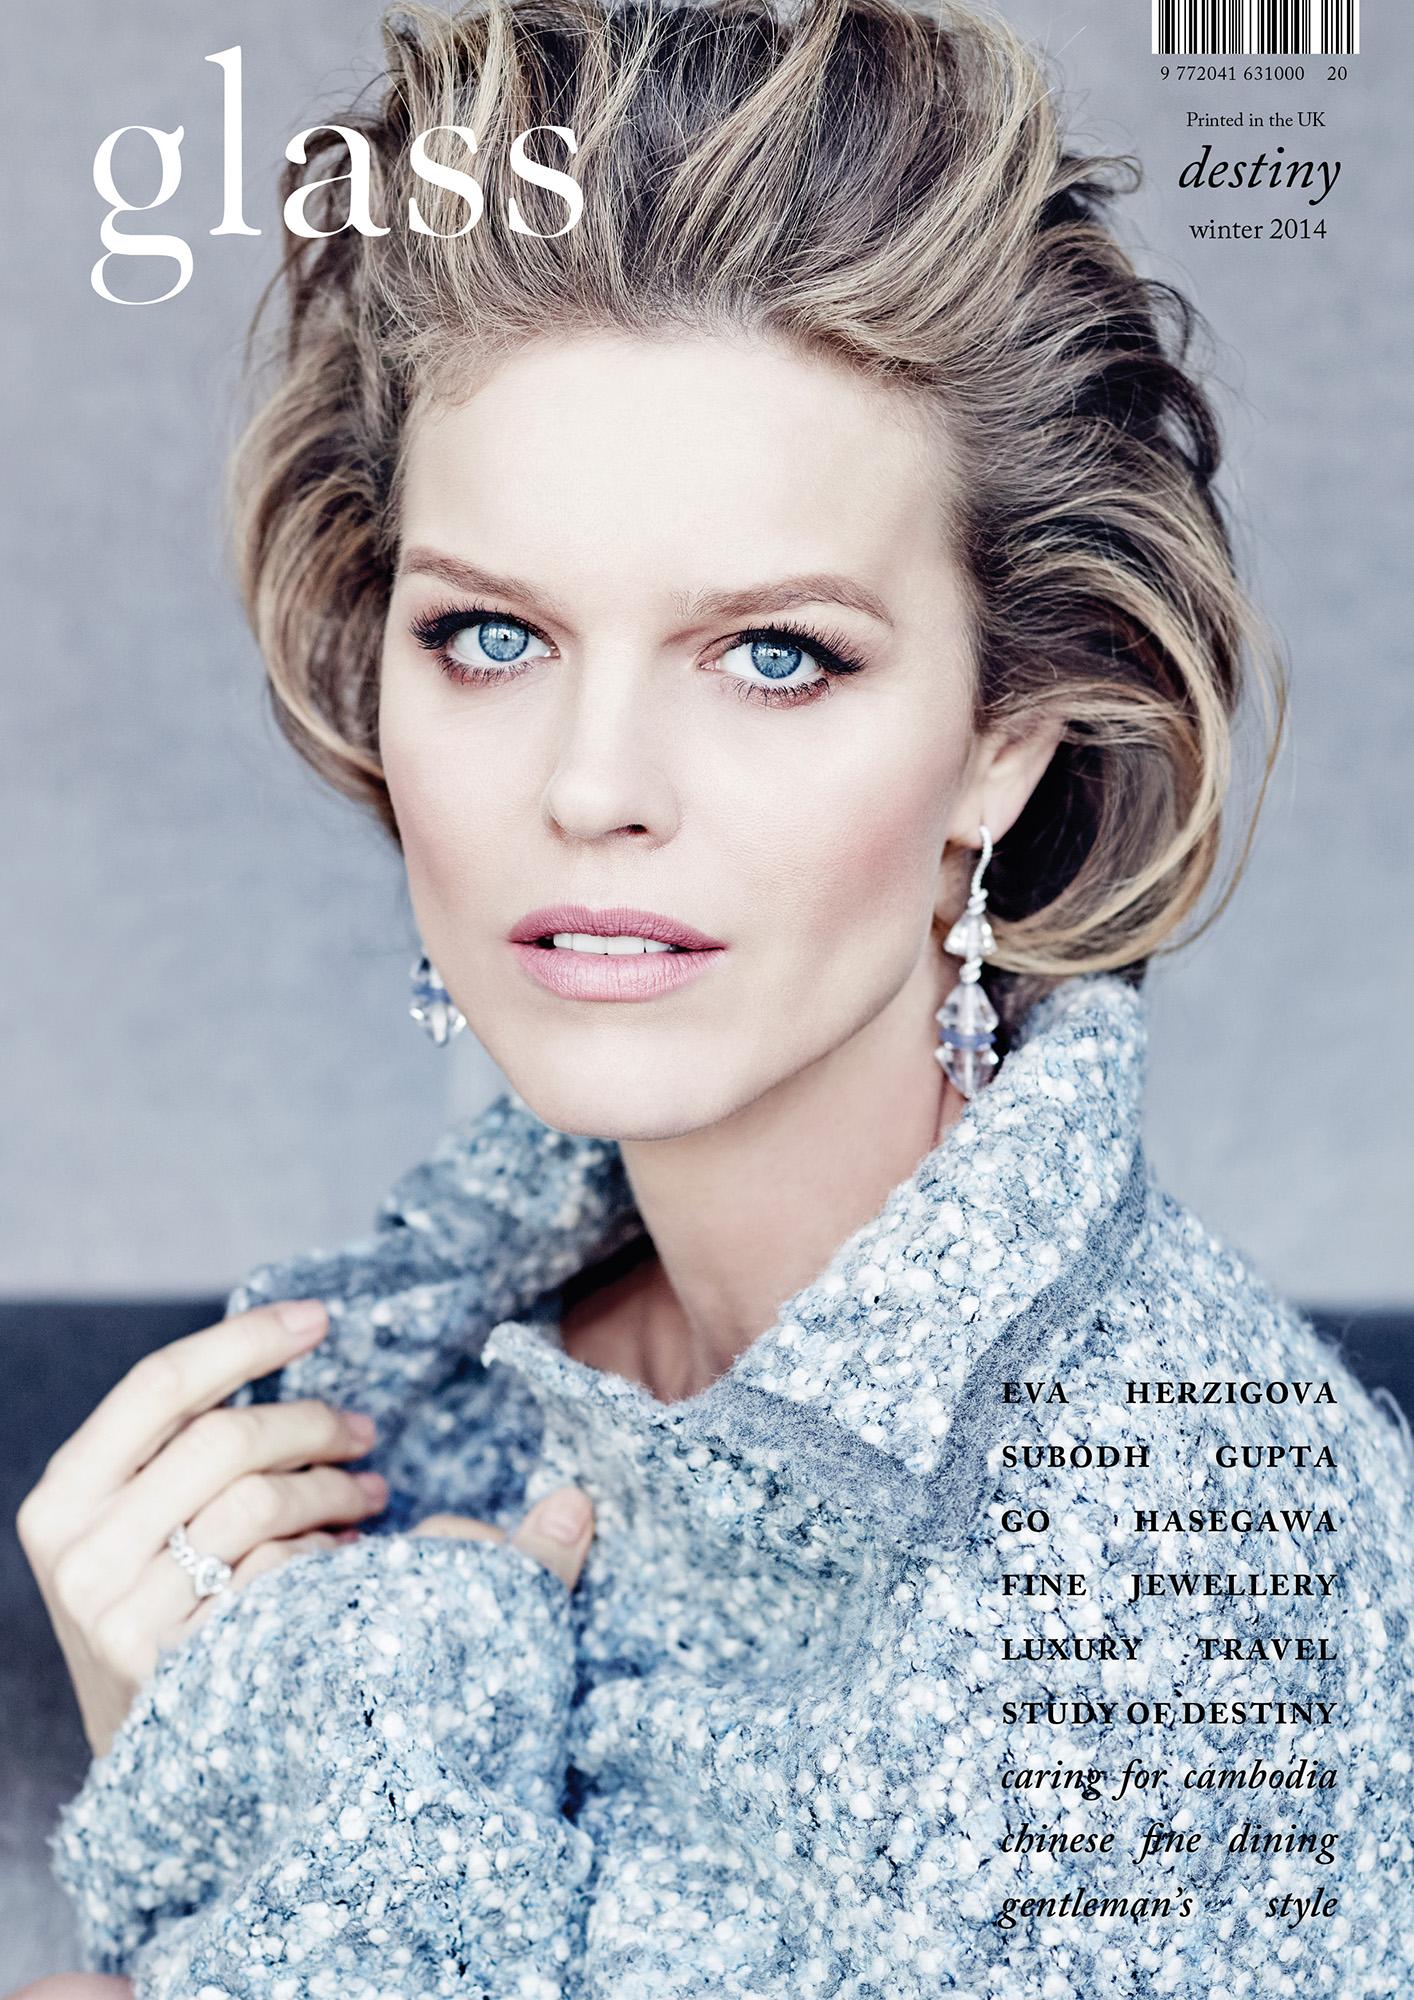 _Glass Magazine 20 - Destiny - C2 Trimmed LR.jpg